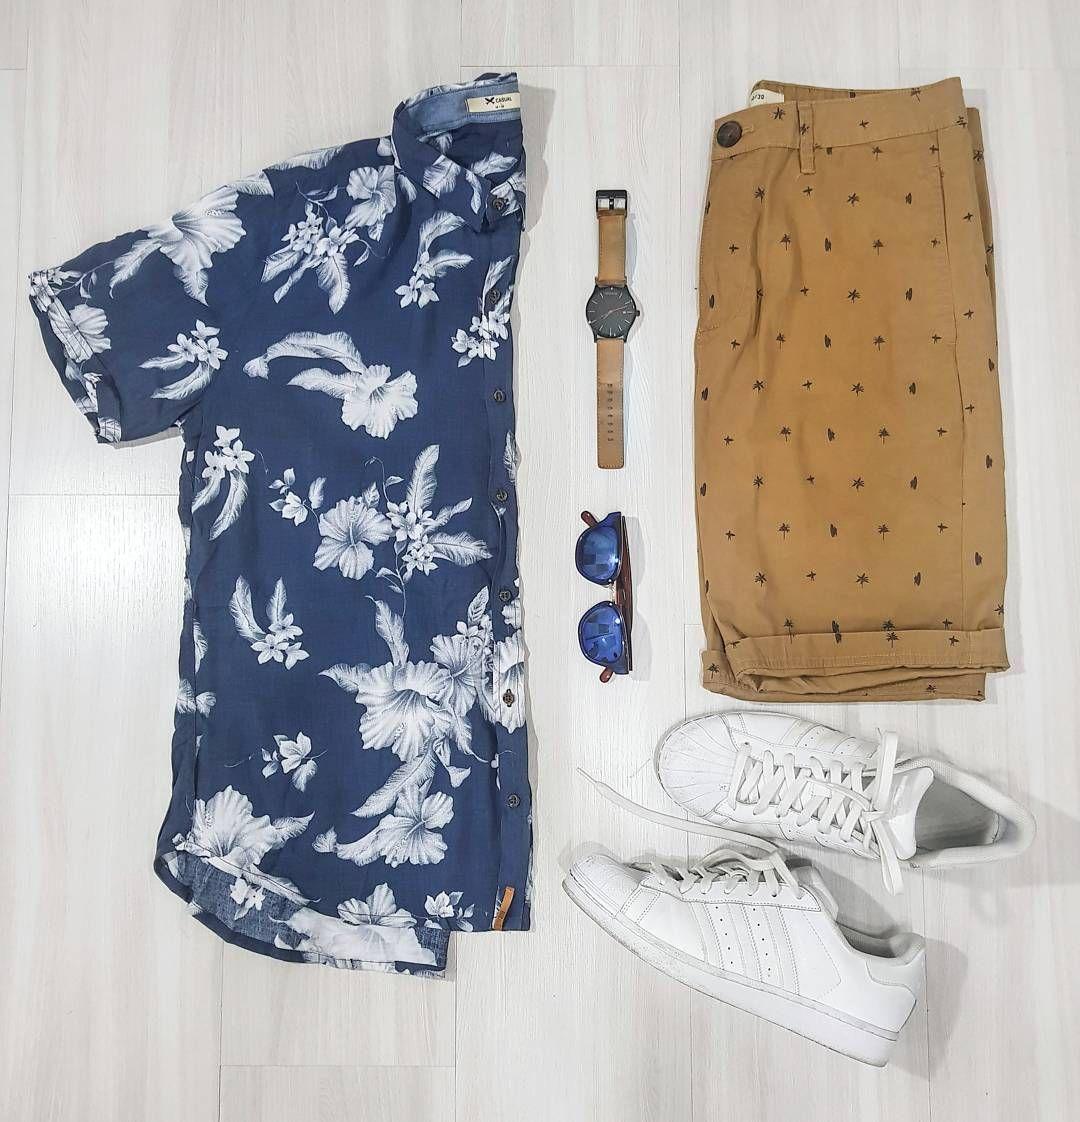 7382726dfcb04 Combo Masculino com Camisa manga Curta Estampada, Estampa Tropical, Camisa  Resort, Bermuda Marrom